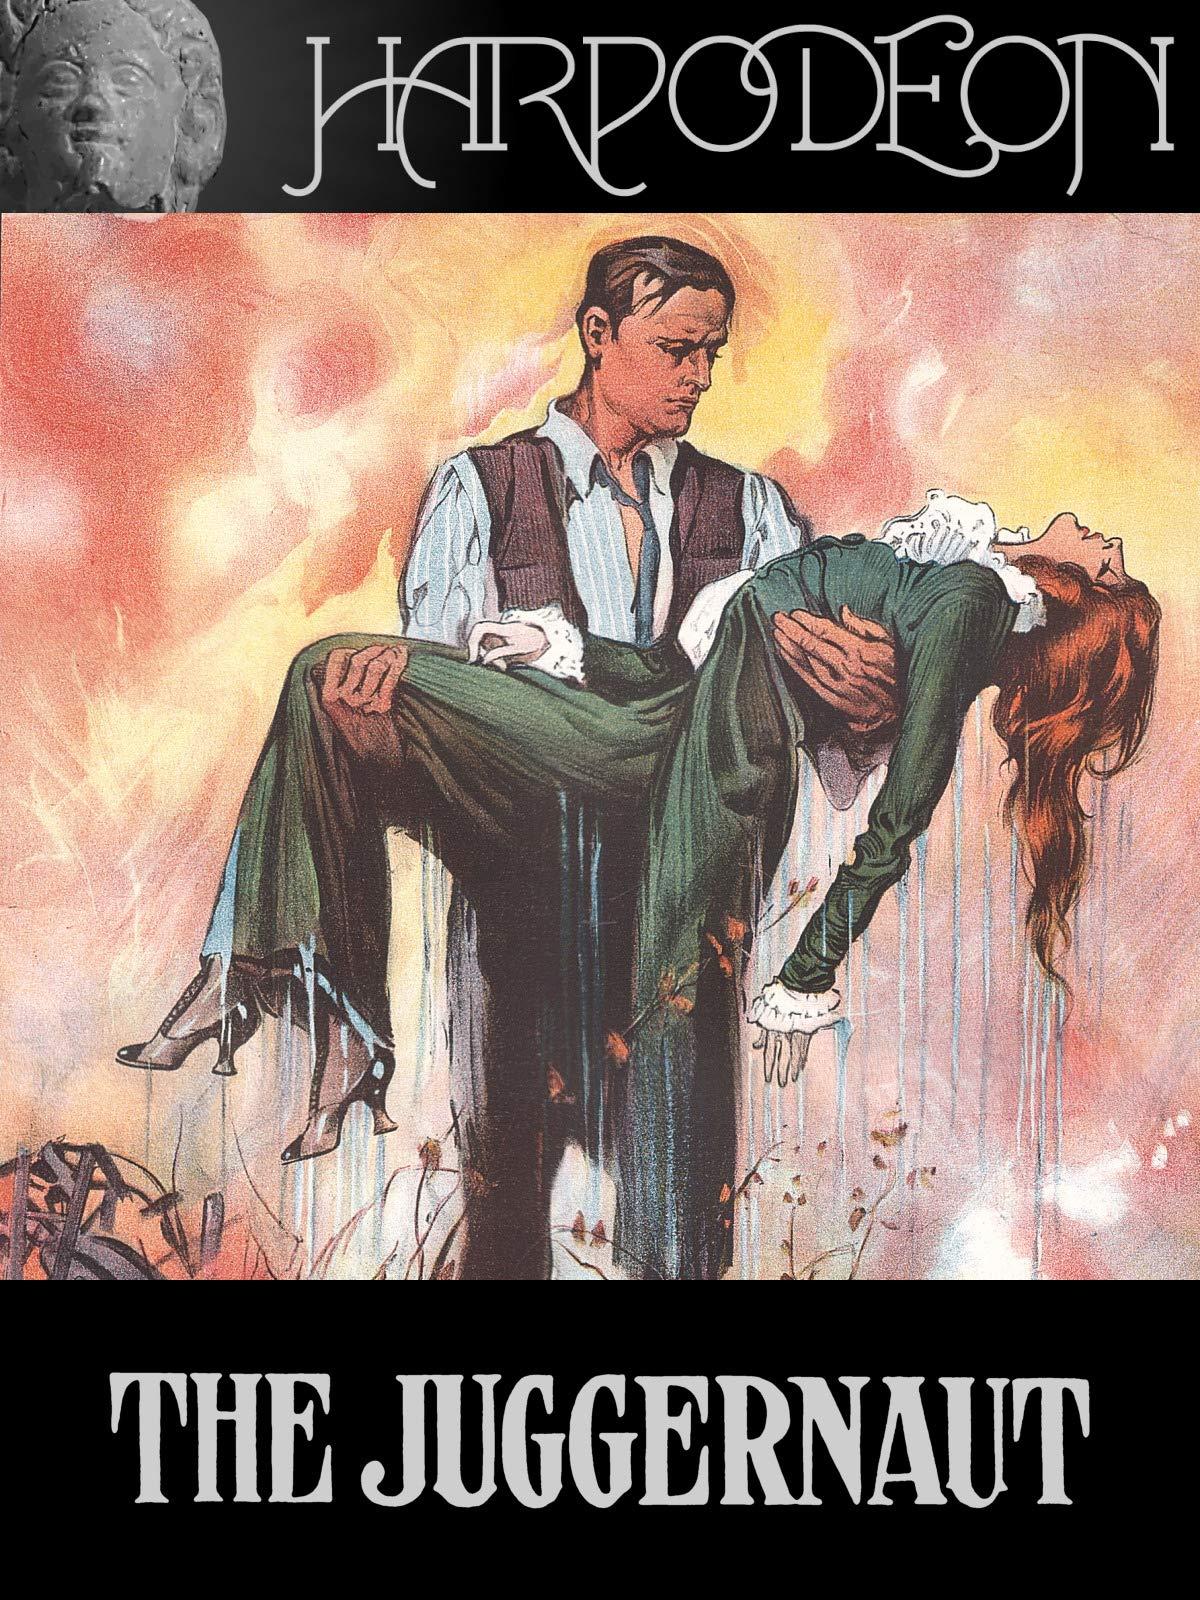 The Juggernaut (1915) on Amazon Prime Video UK